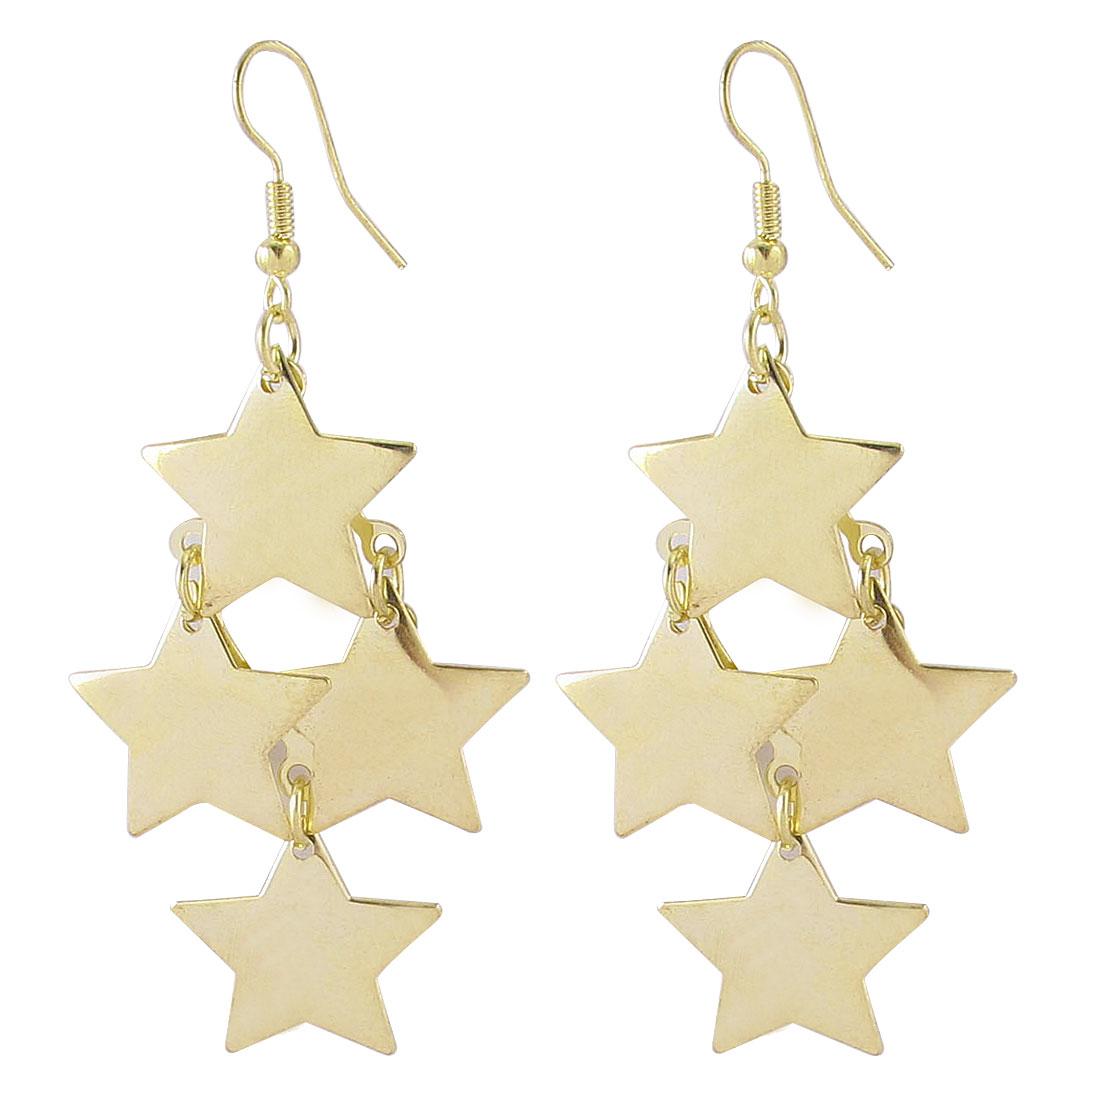 Lady Hollow Star Shape Dangle Chandelier Fish Hook Earrings Gold Tone Pair